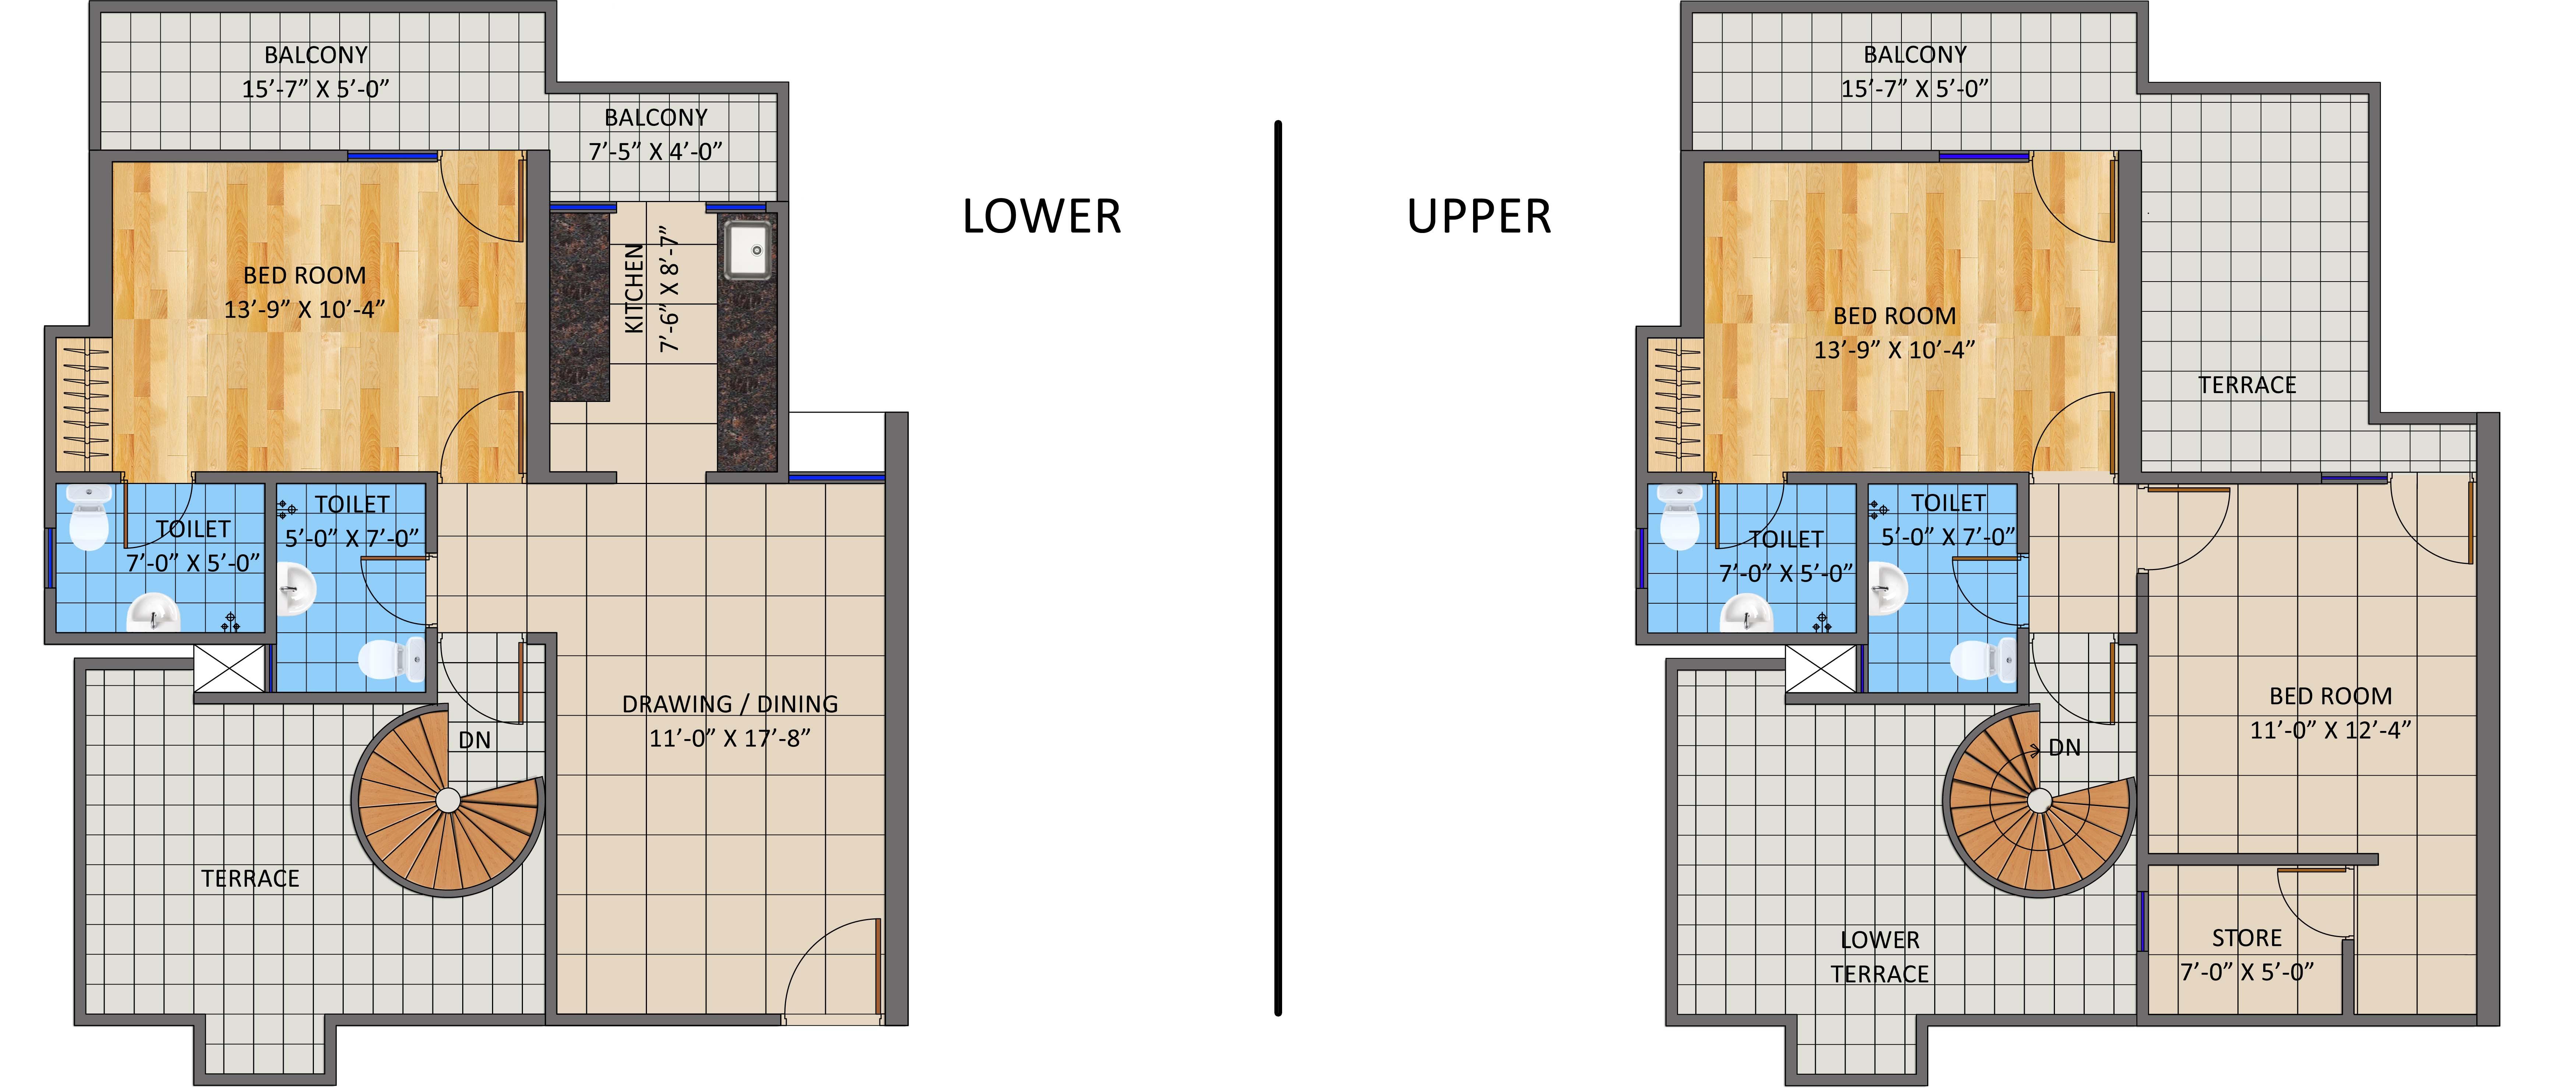 https://www.kwgroup.in/upload/170420105713Plan-Tower-D,-3-BHK-(Penthouse-Lower-&-Upper),-1900-sqft.jpg